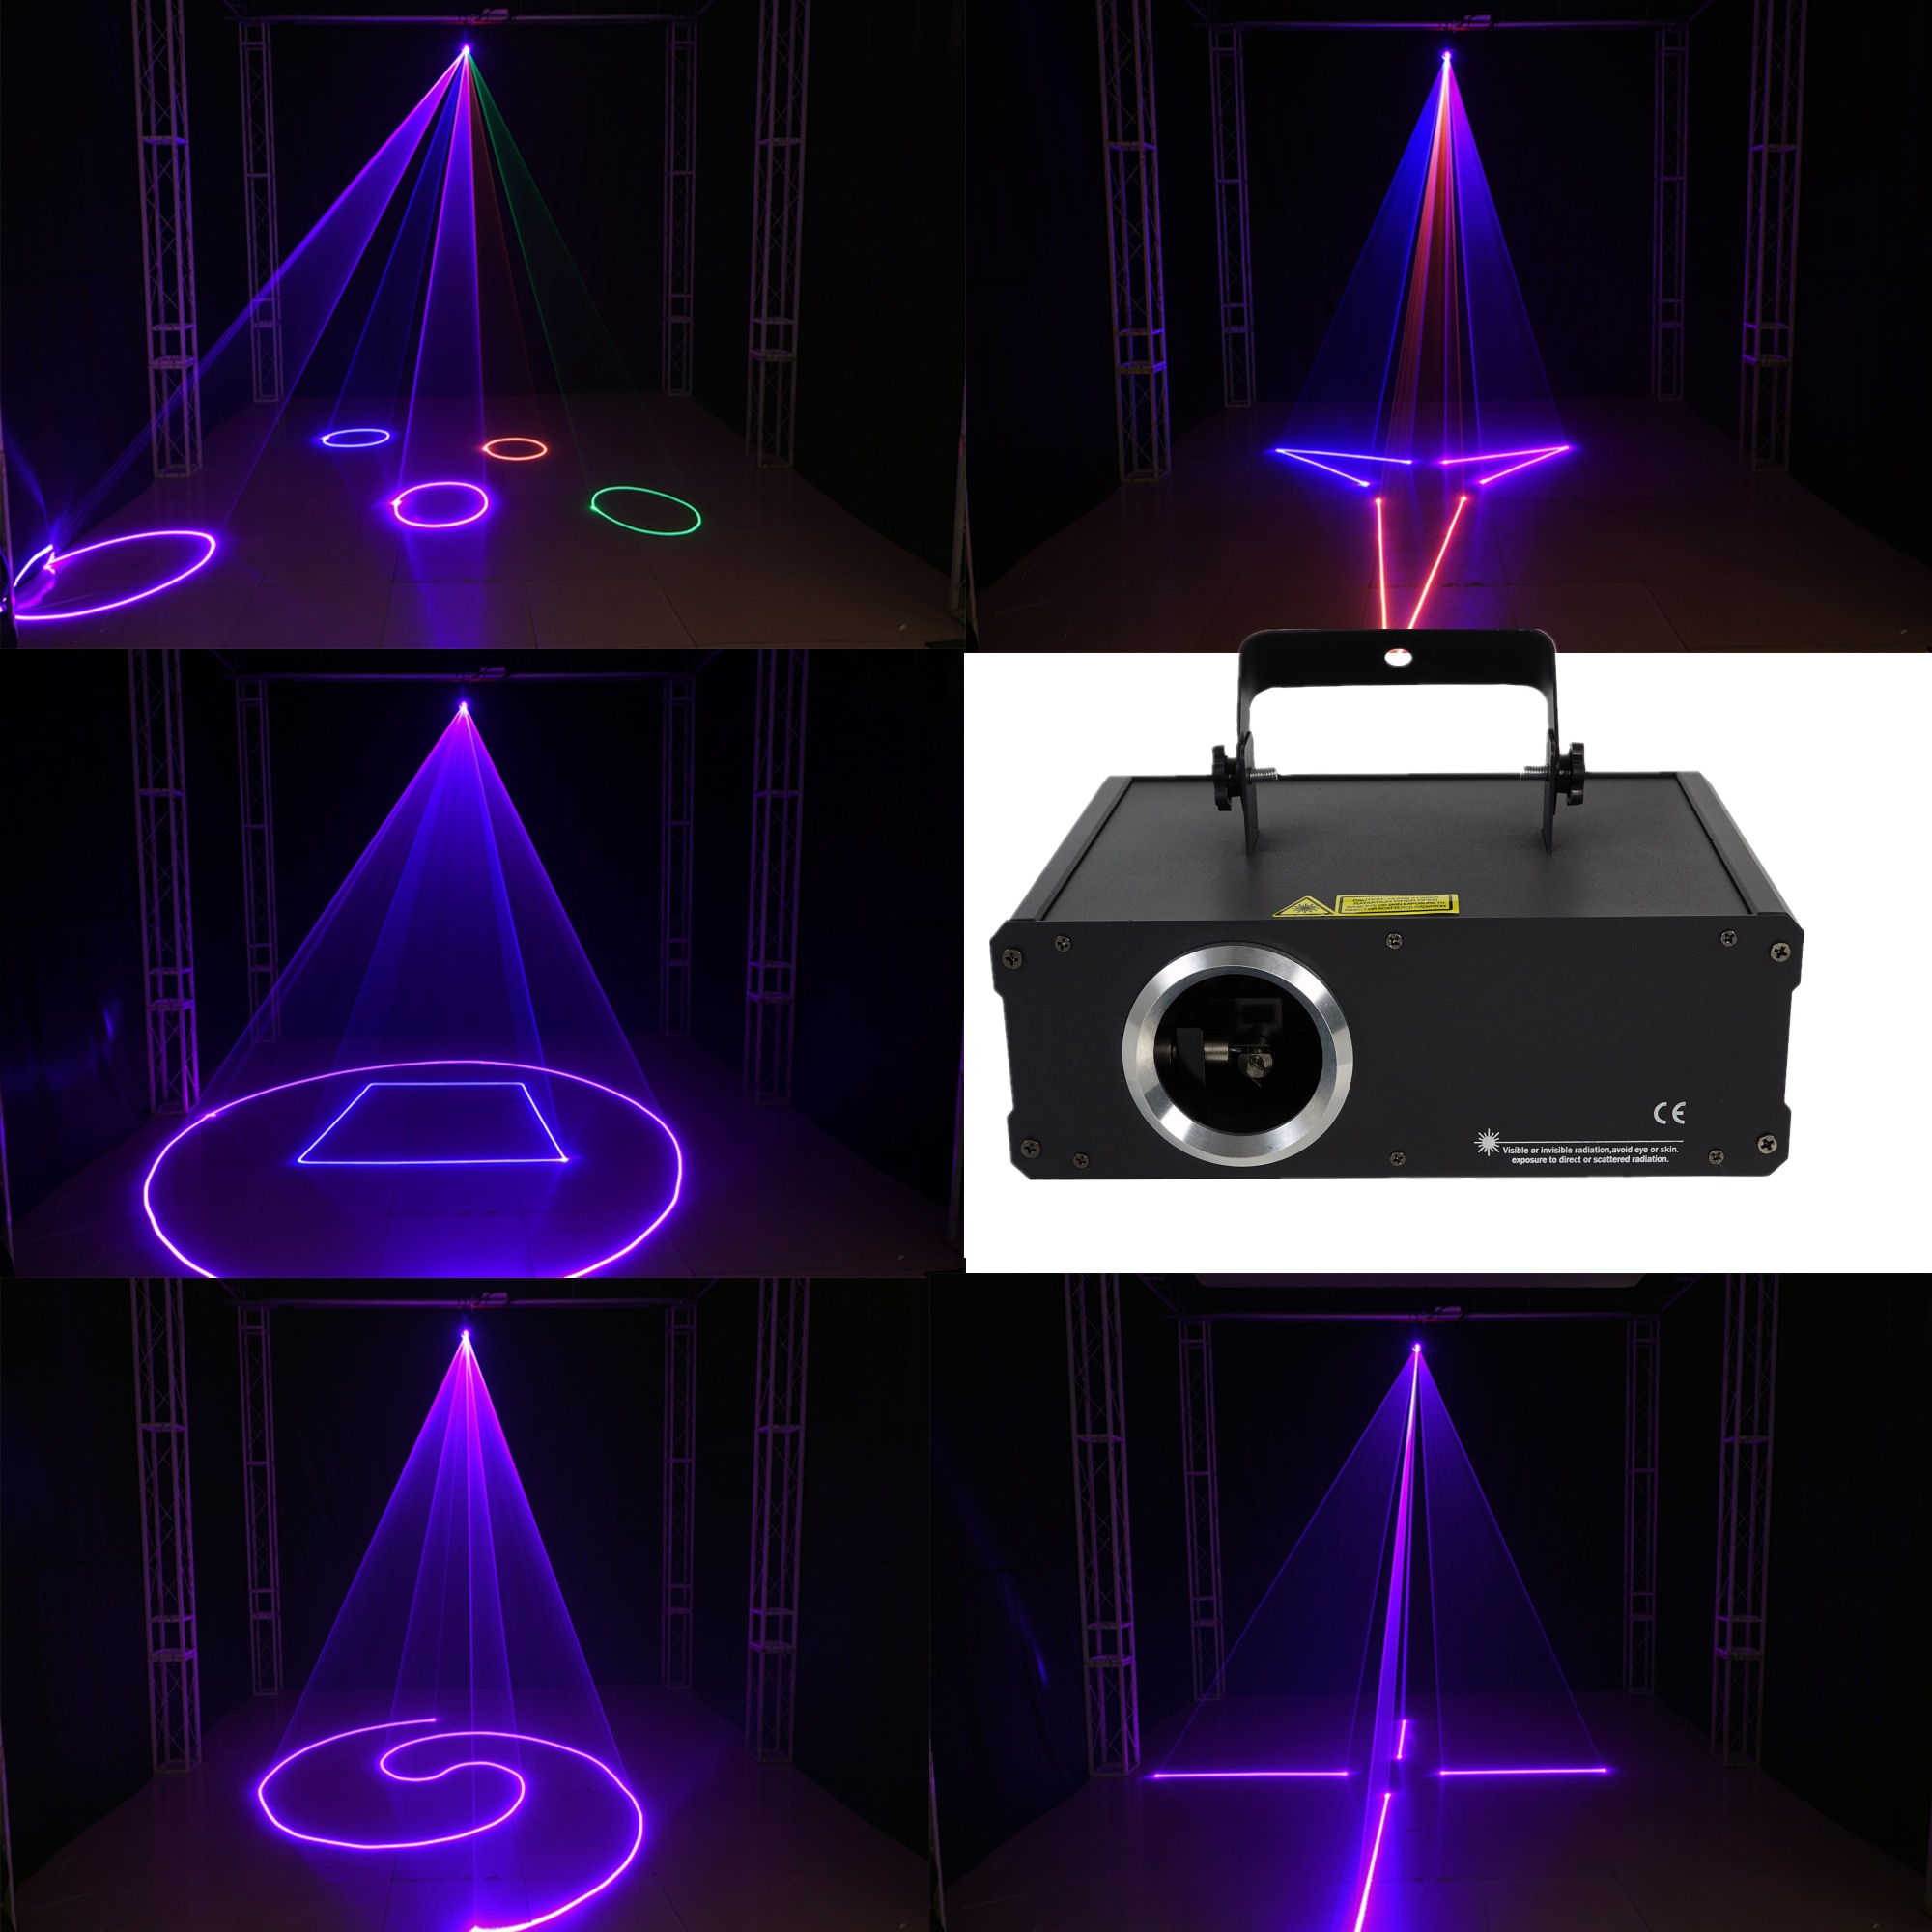 2D ثلاثية الأبعاد RGB ليزر الرسوم المتحركة الخفيفة 500mW 1 واط العارض ليزر DMX ضوء شعاع المسح DJ عرض الحفلات المرحلة الإضاءة